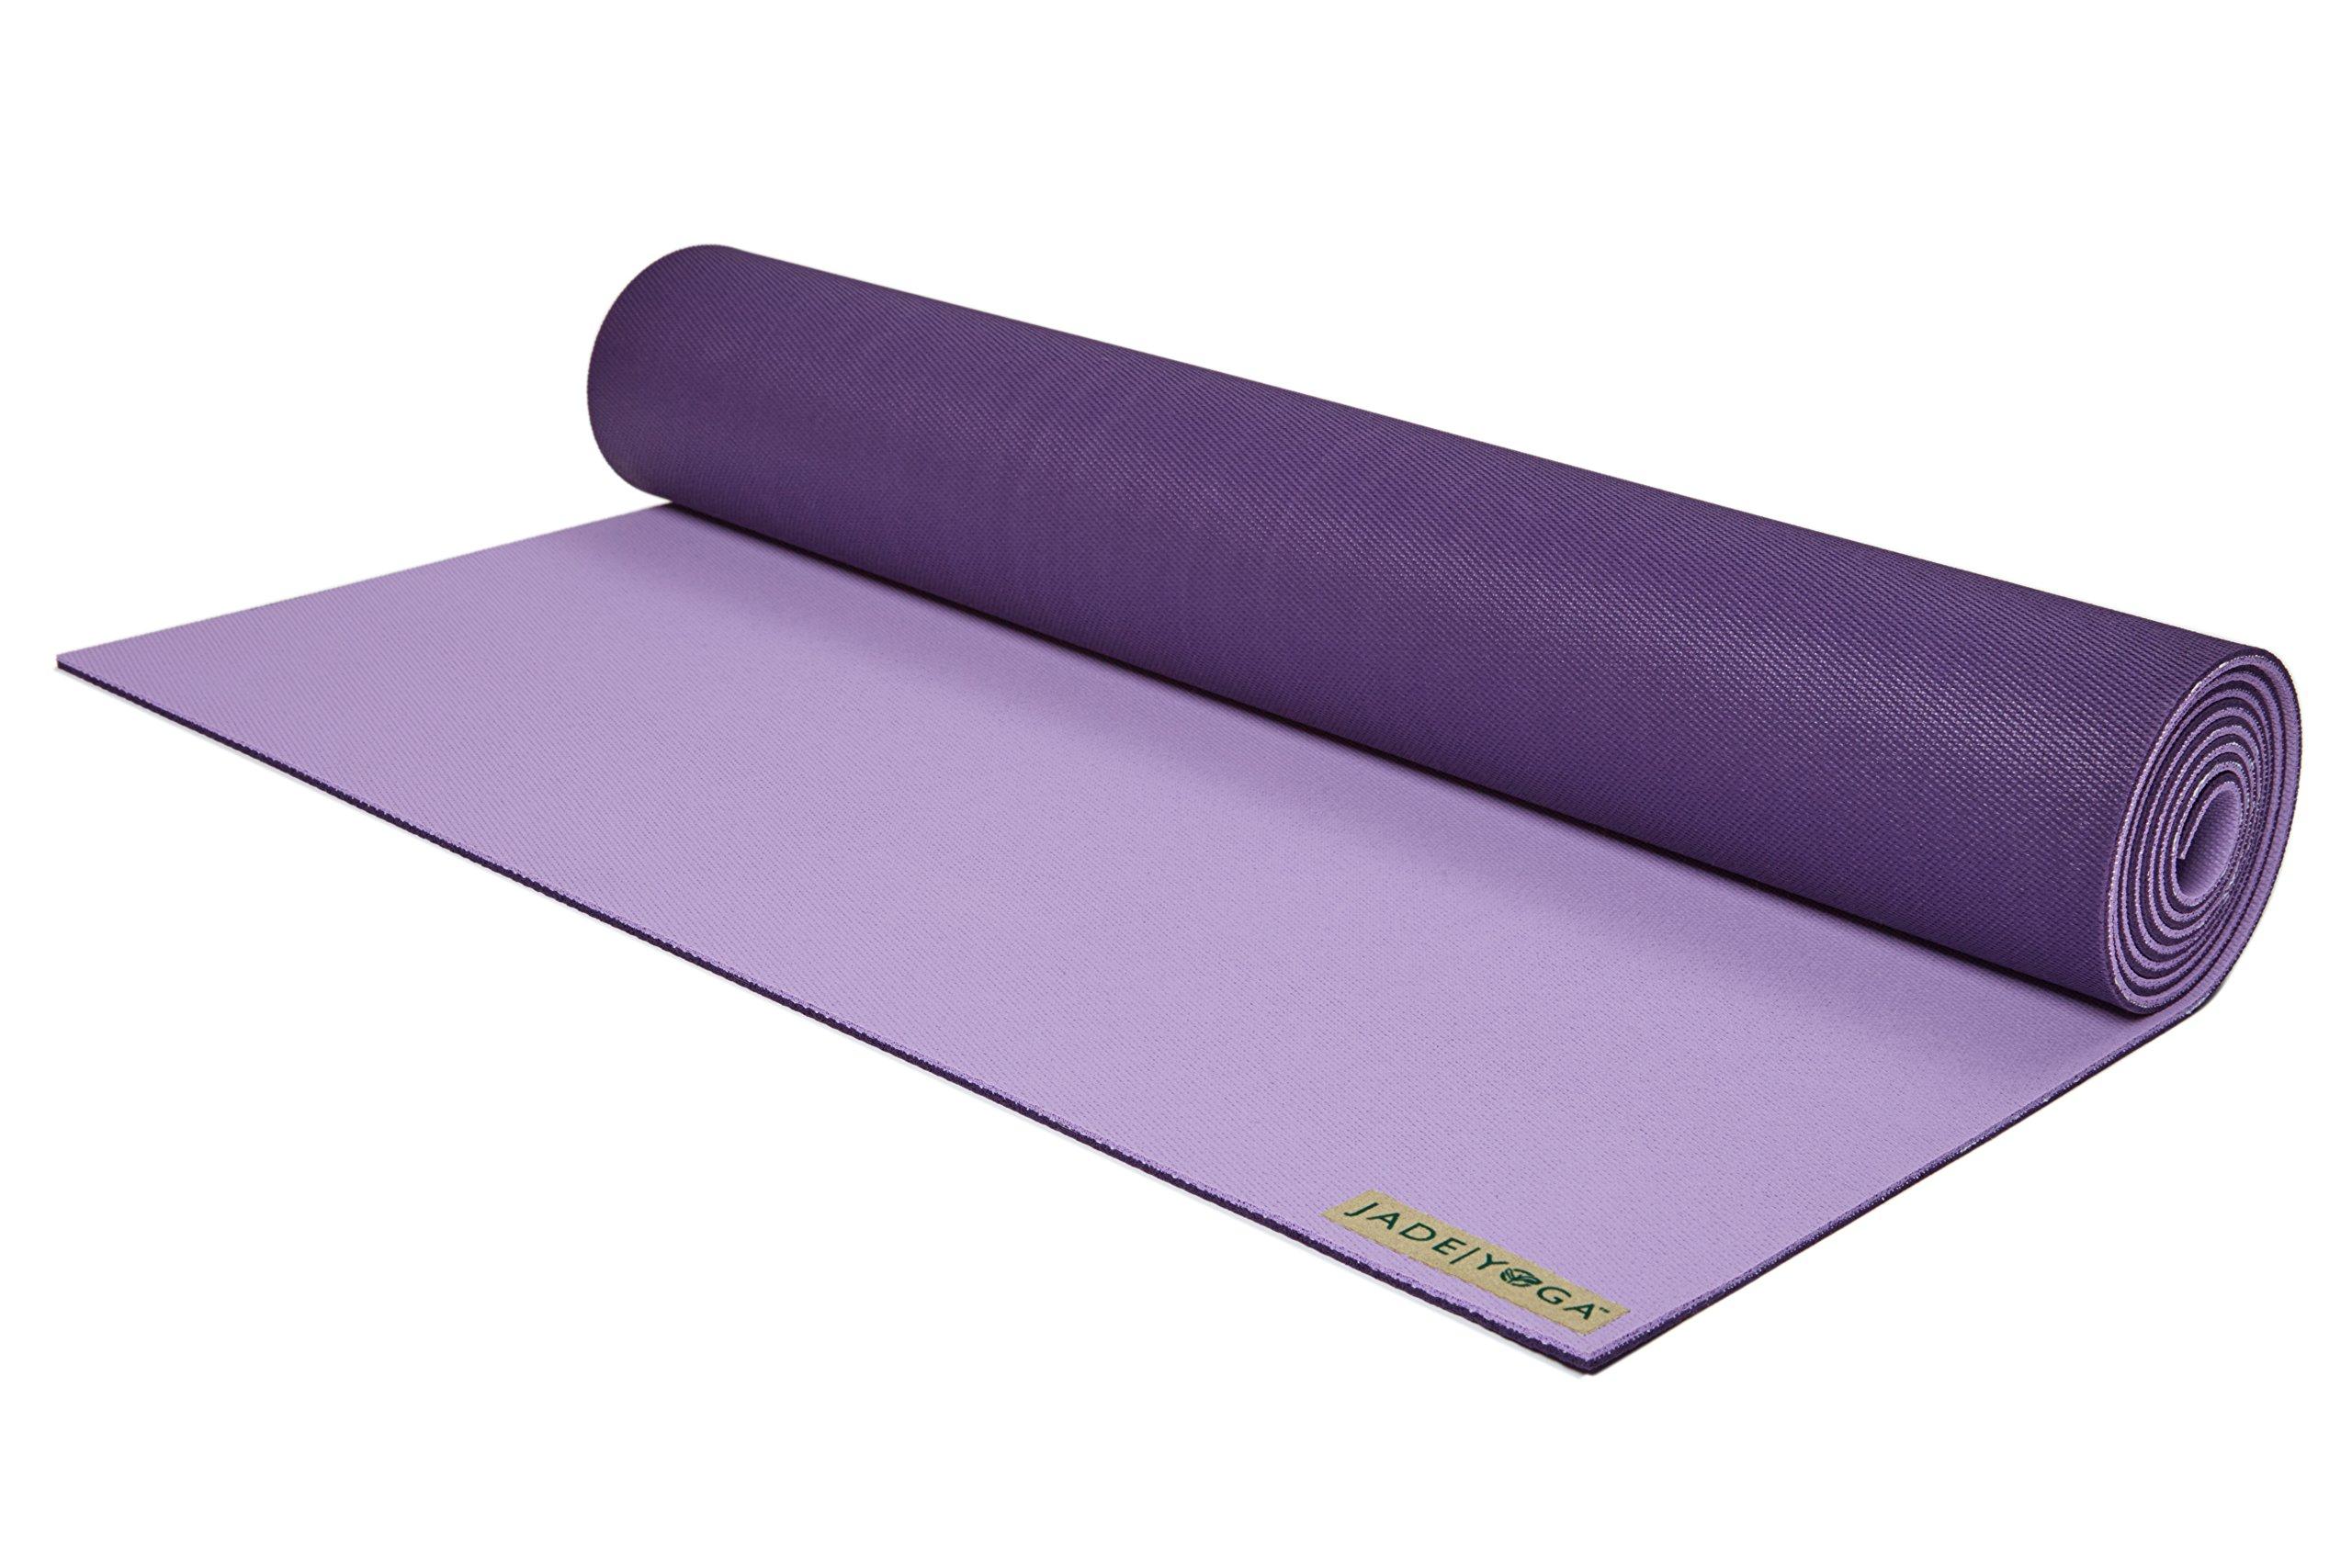 Jade Yoga Harmony 71-Inch Yoga Mat (Lavender/Purple)